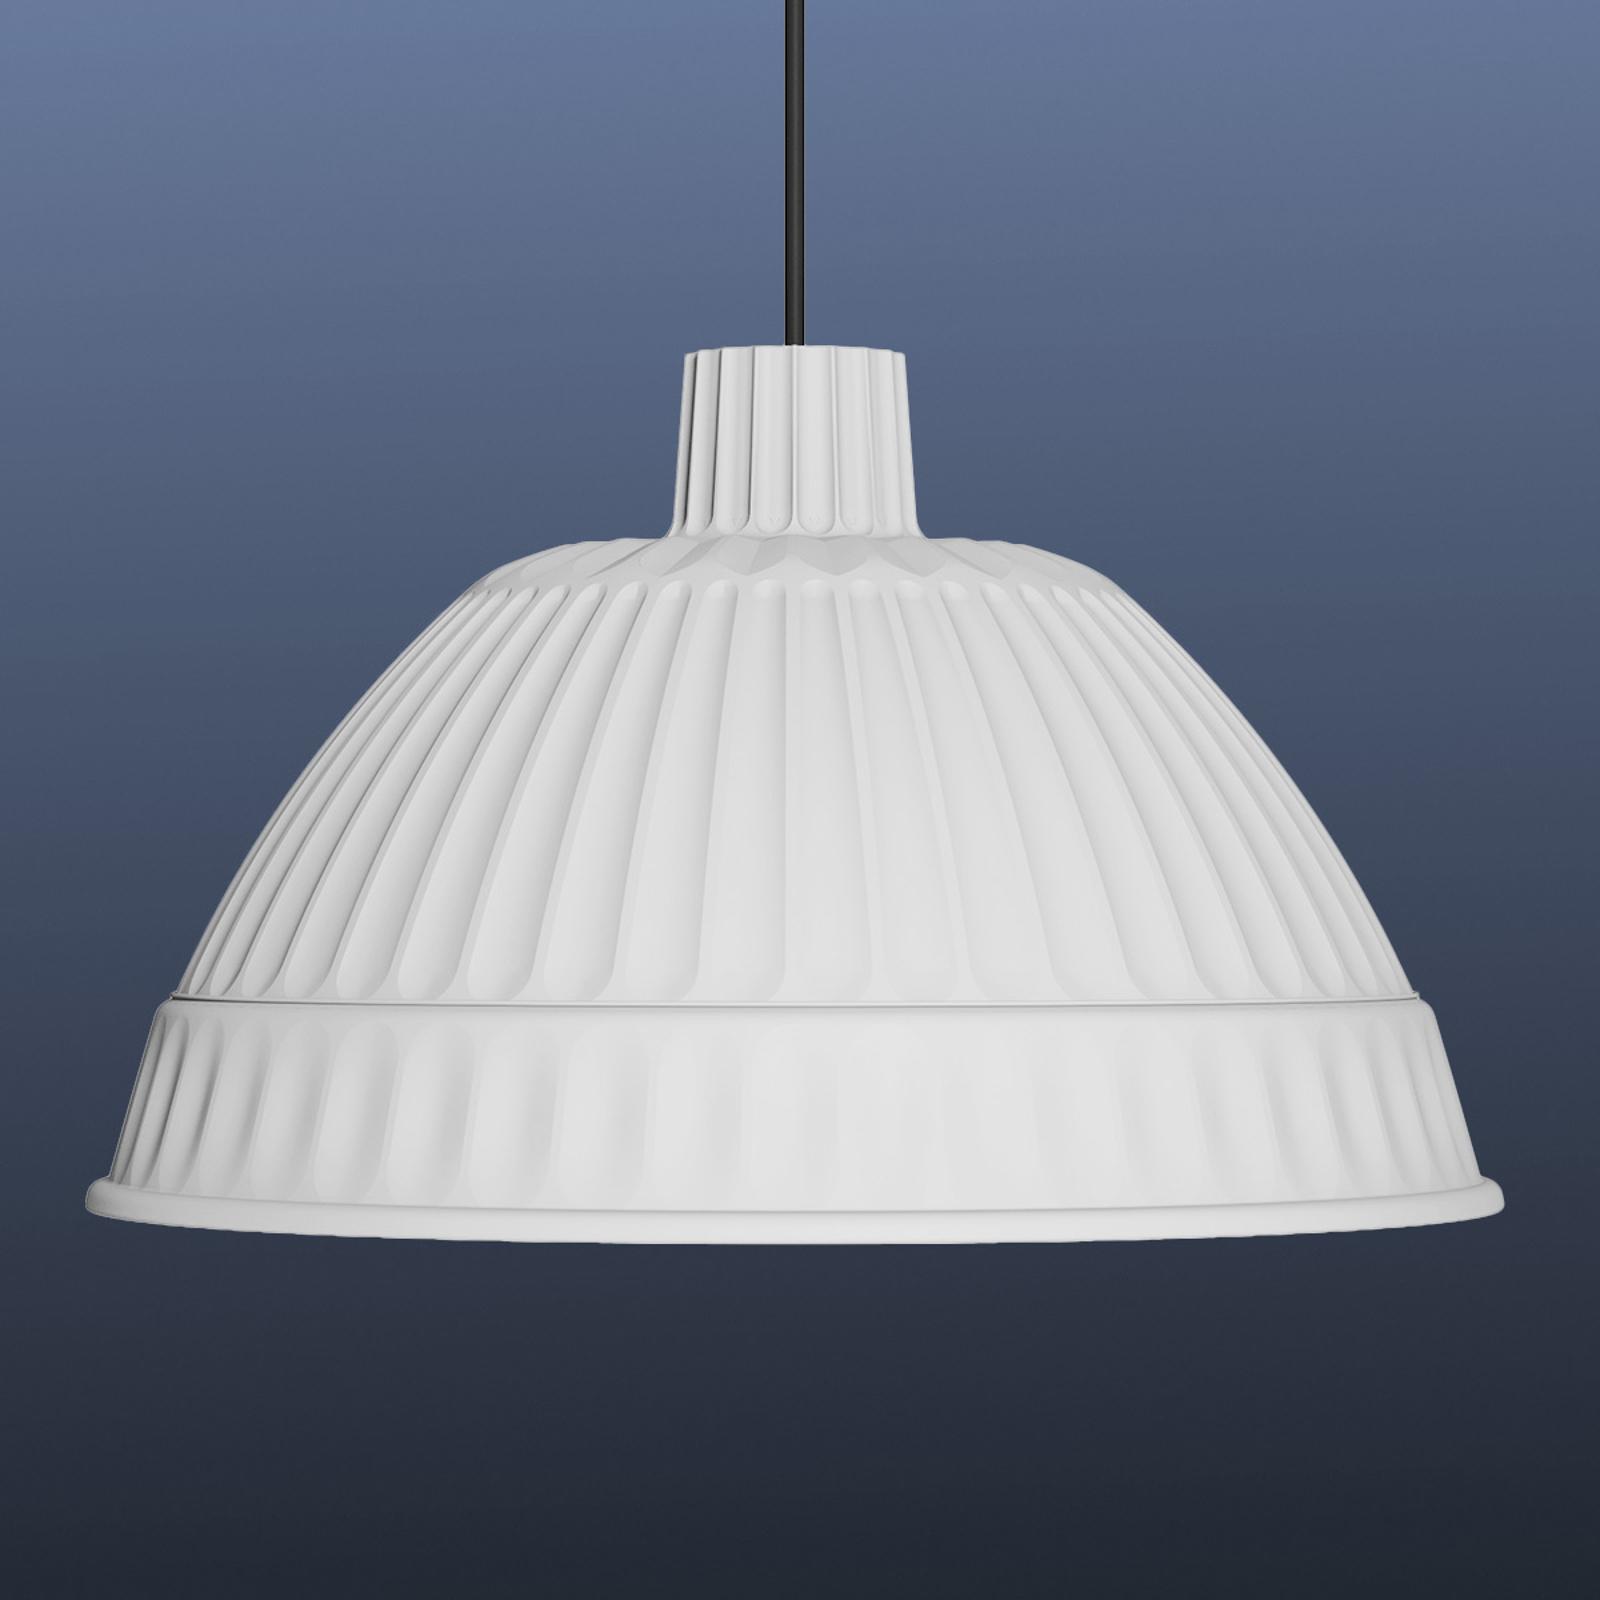 Biała designerska lampa wisząca Cloche